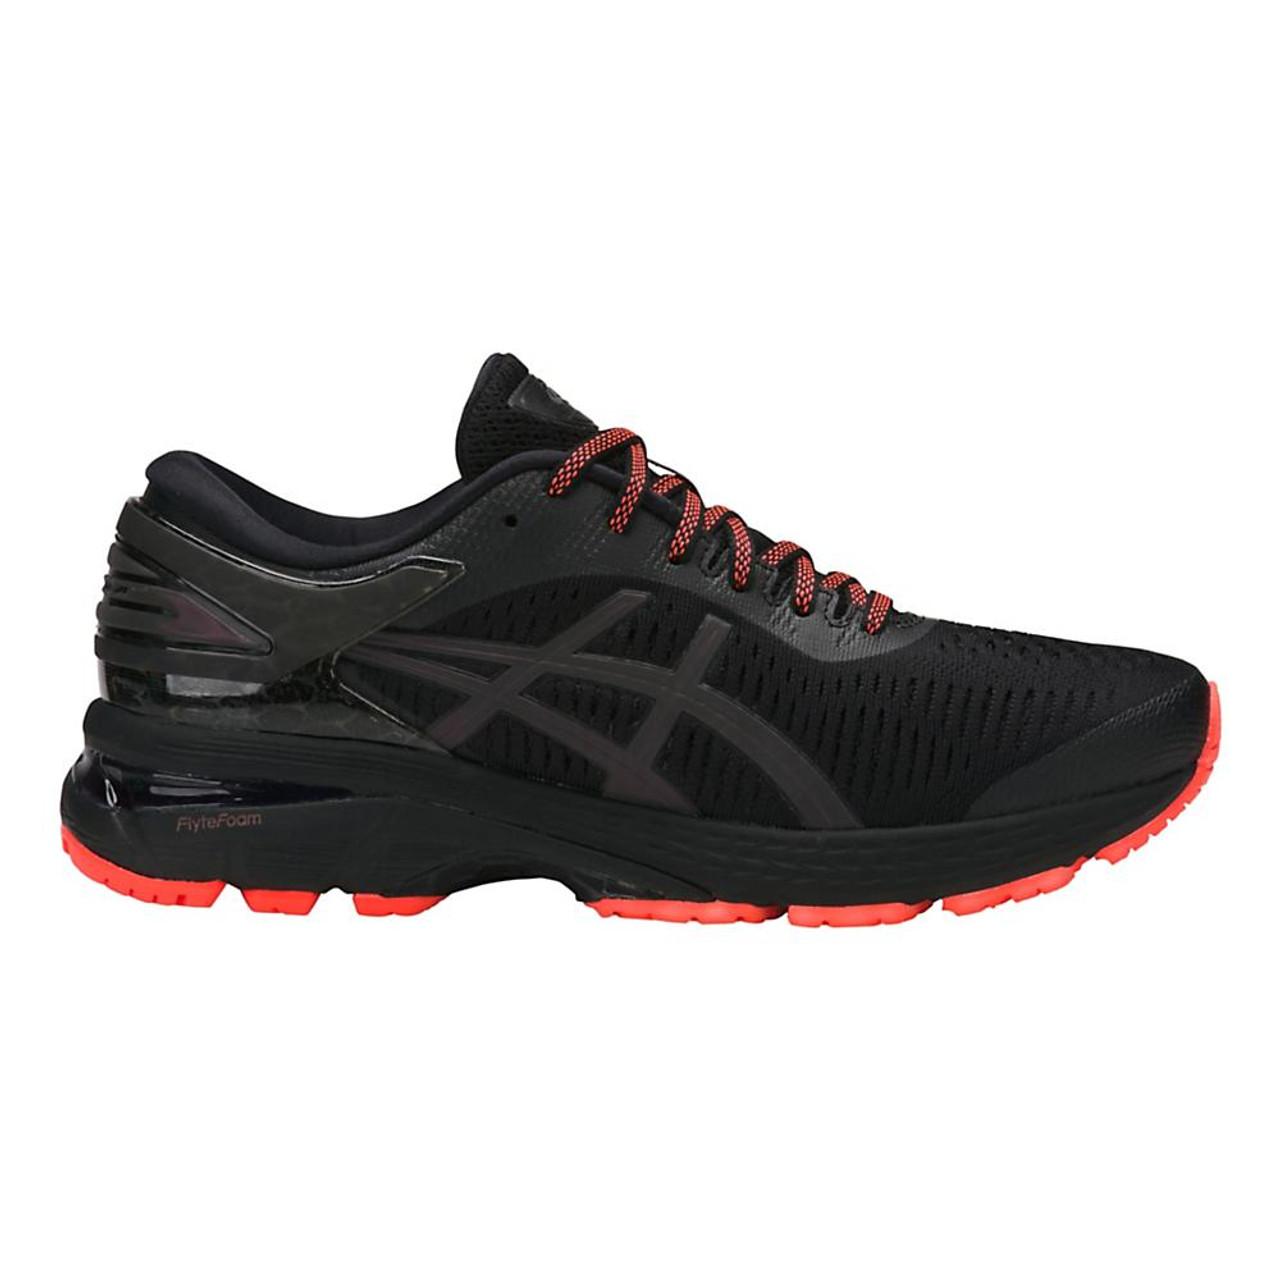 dcf827d5dd528 Women's ASICS GEL-Kayano 25 Lite-Show Running Shoes | Free 3-Day Shipping